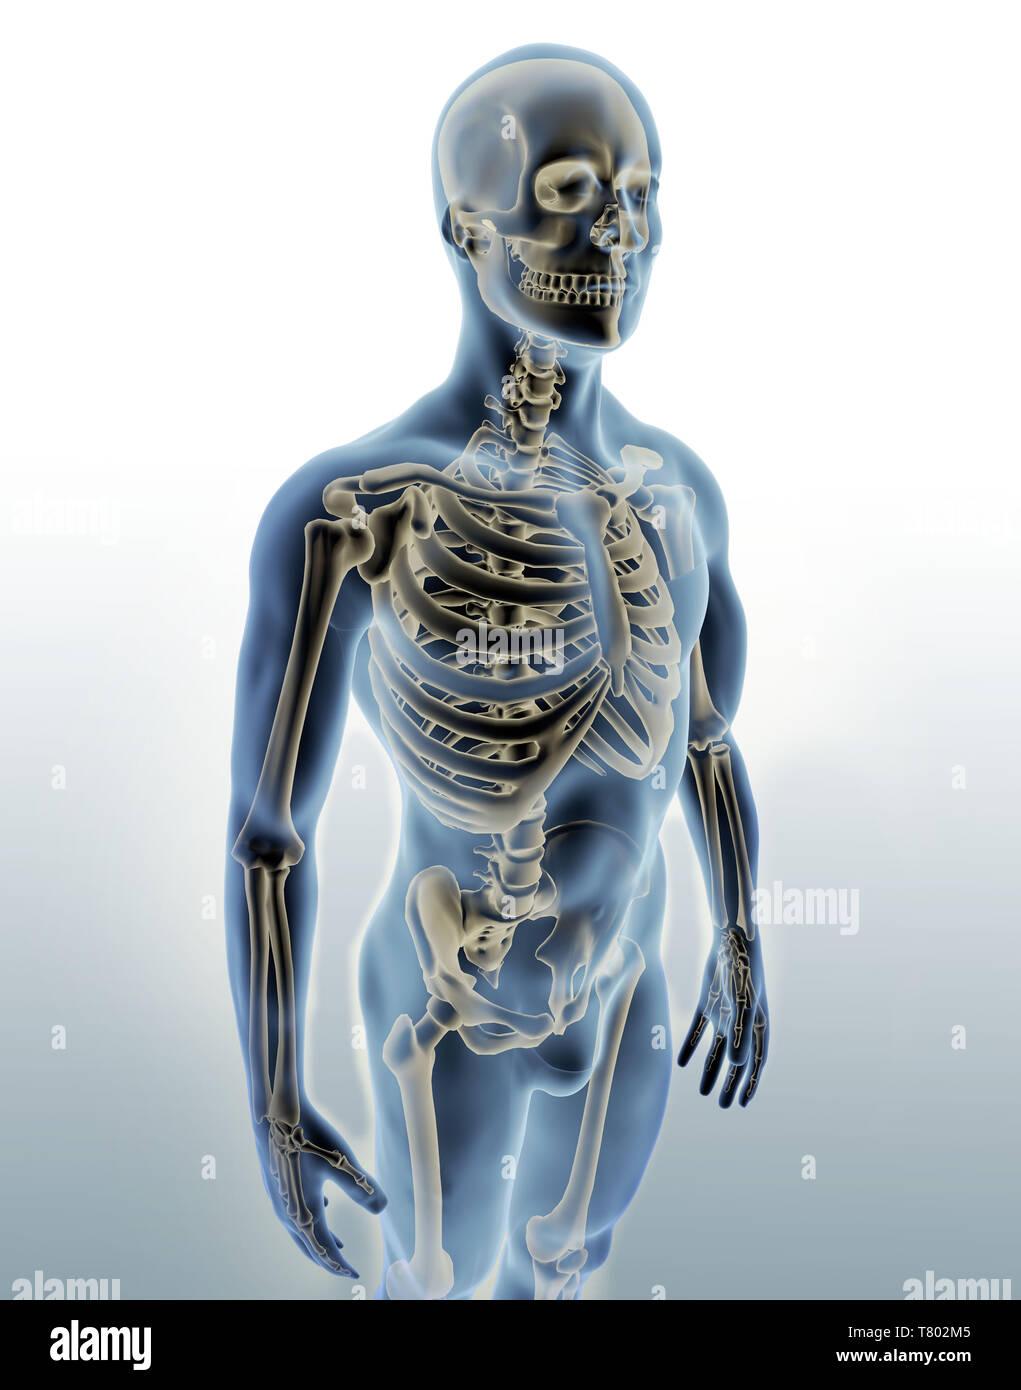 Man with Visible Skeleton, Illustration - Stock Image